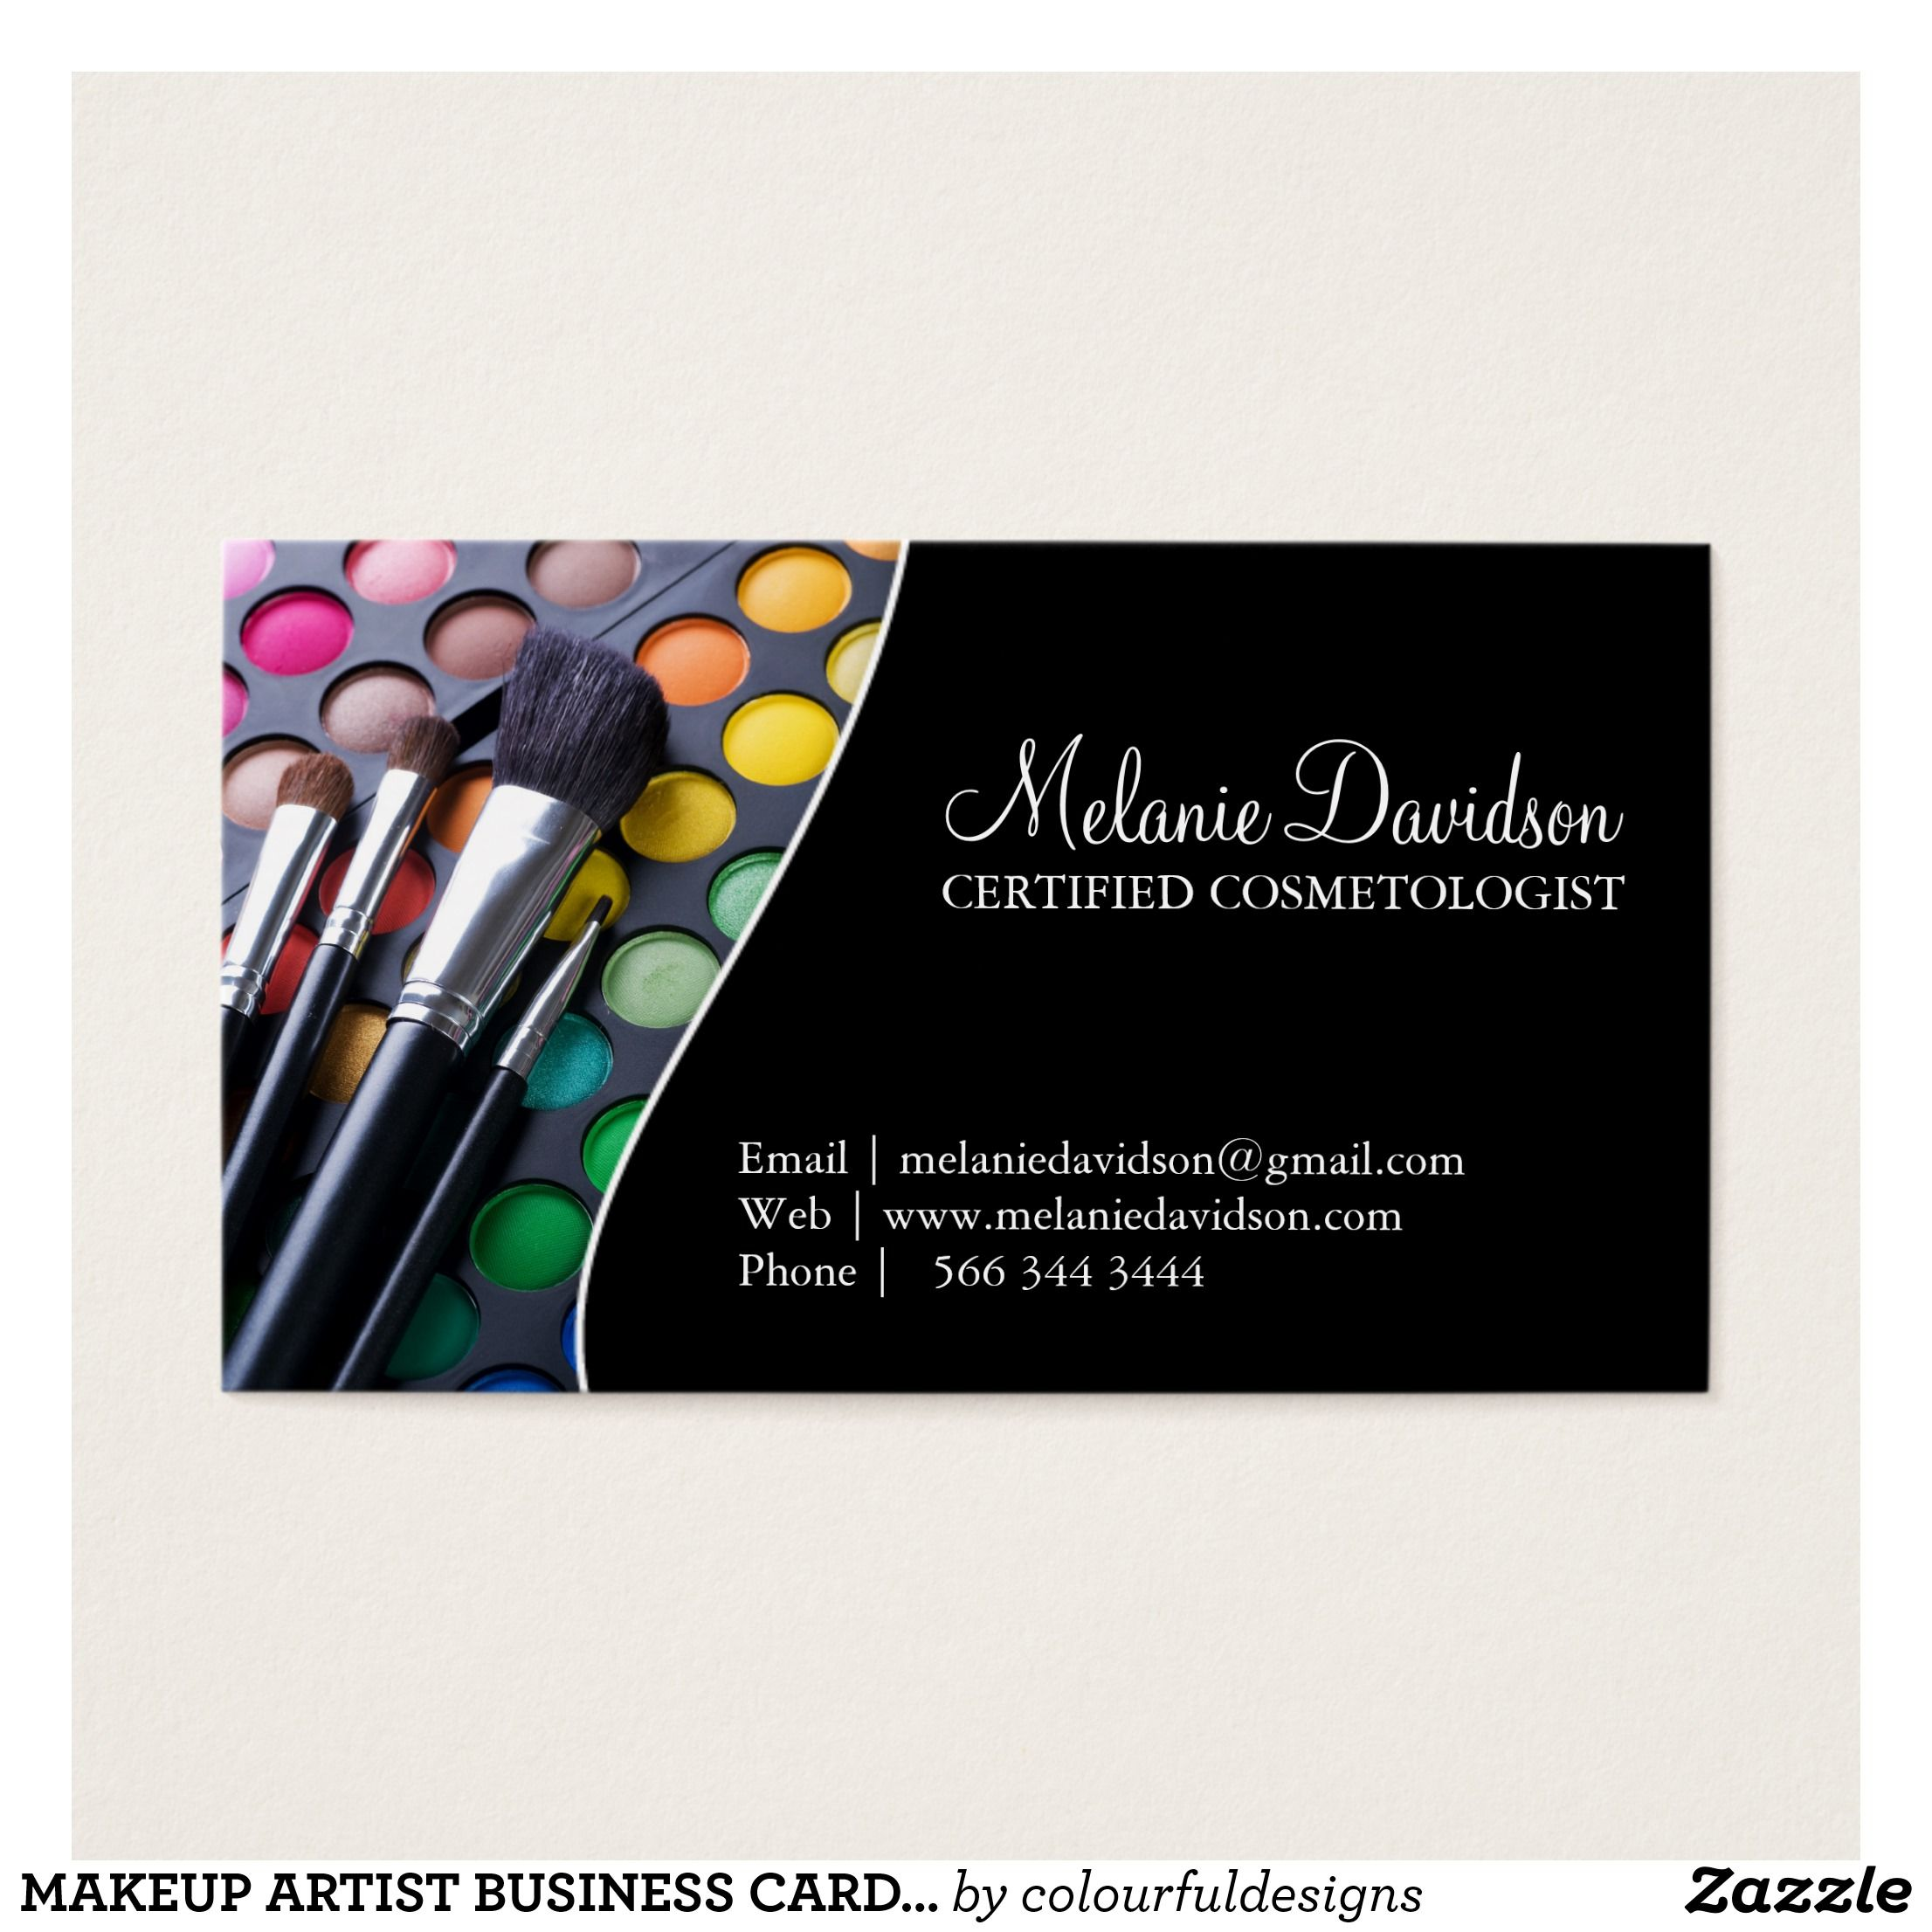 Makeup Artist Business Card Template Zazzle Com Makeup Artist Business Cards Templates Makeup Artist Business Cards Makeup Business Cards